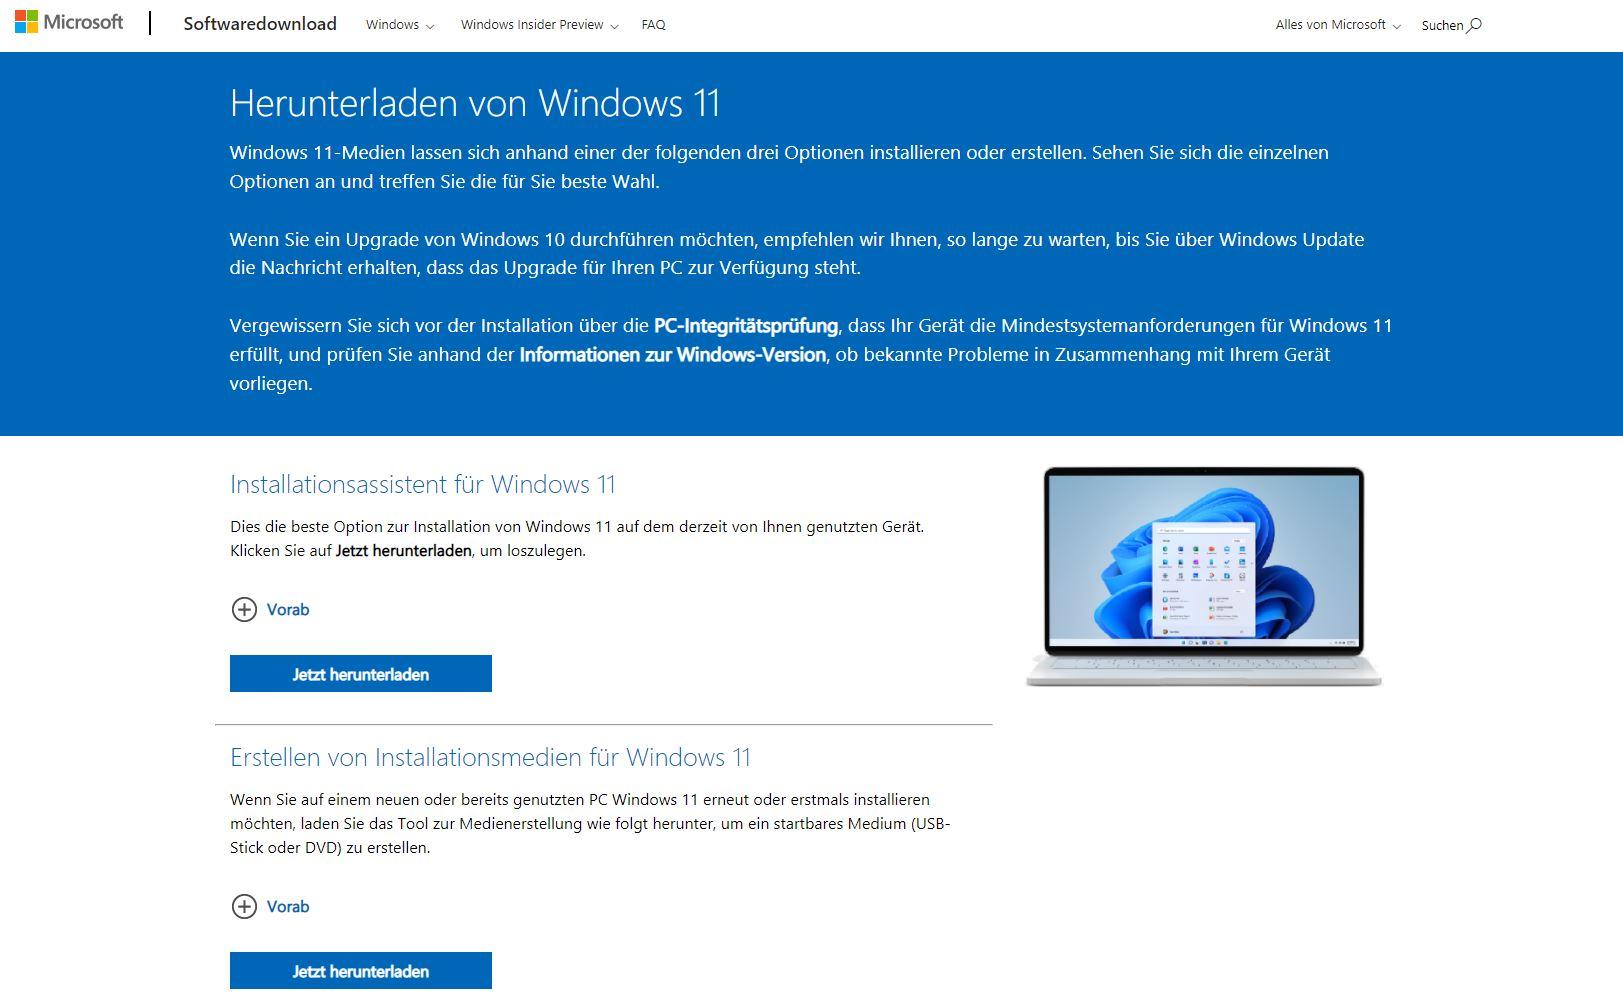 Windows 11 Media Creation Tool Installations-Assistent